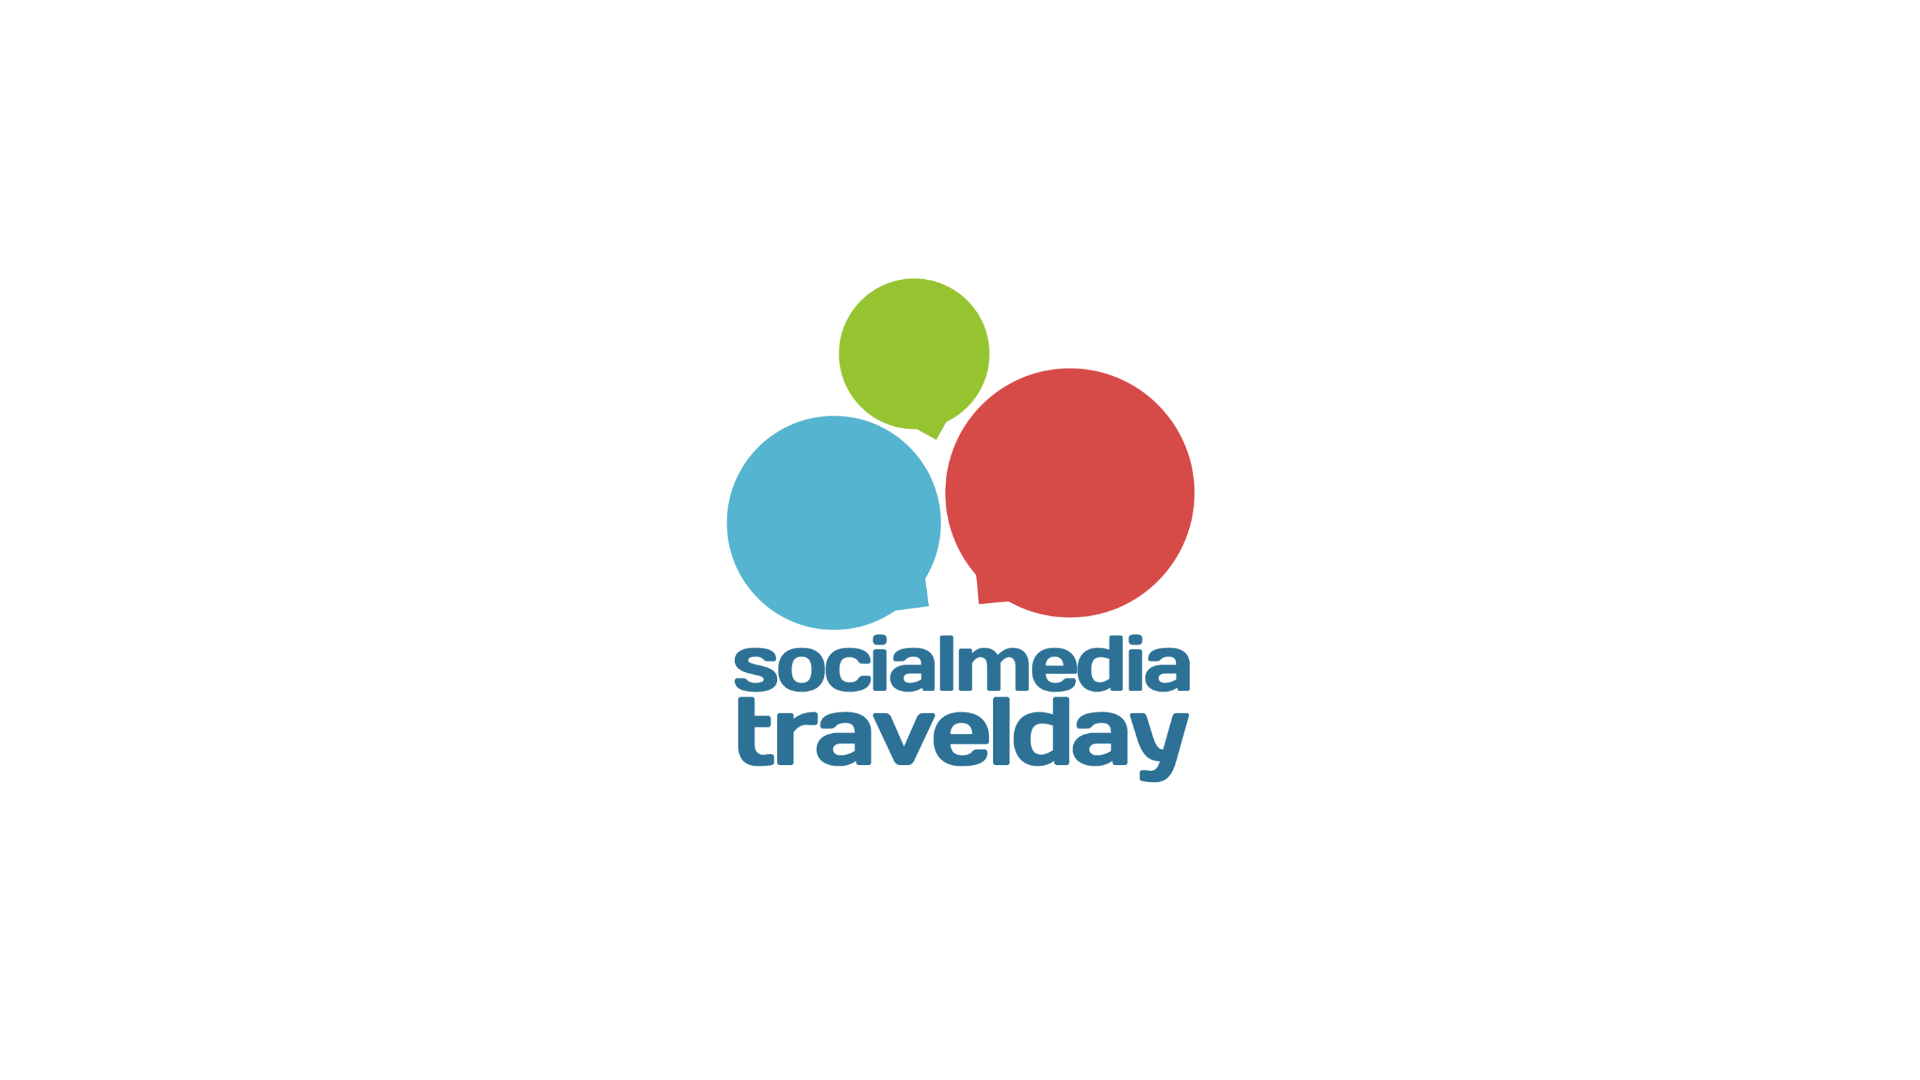 socialmedia travelday